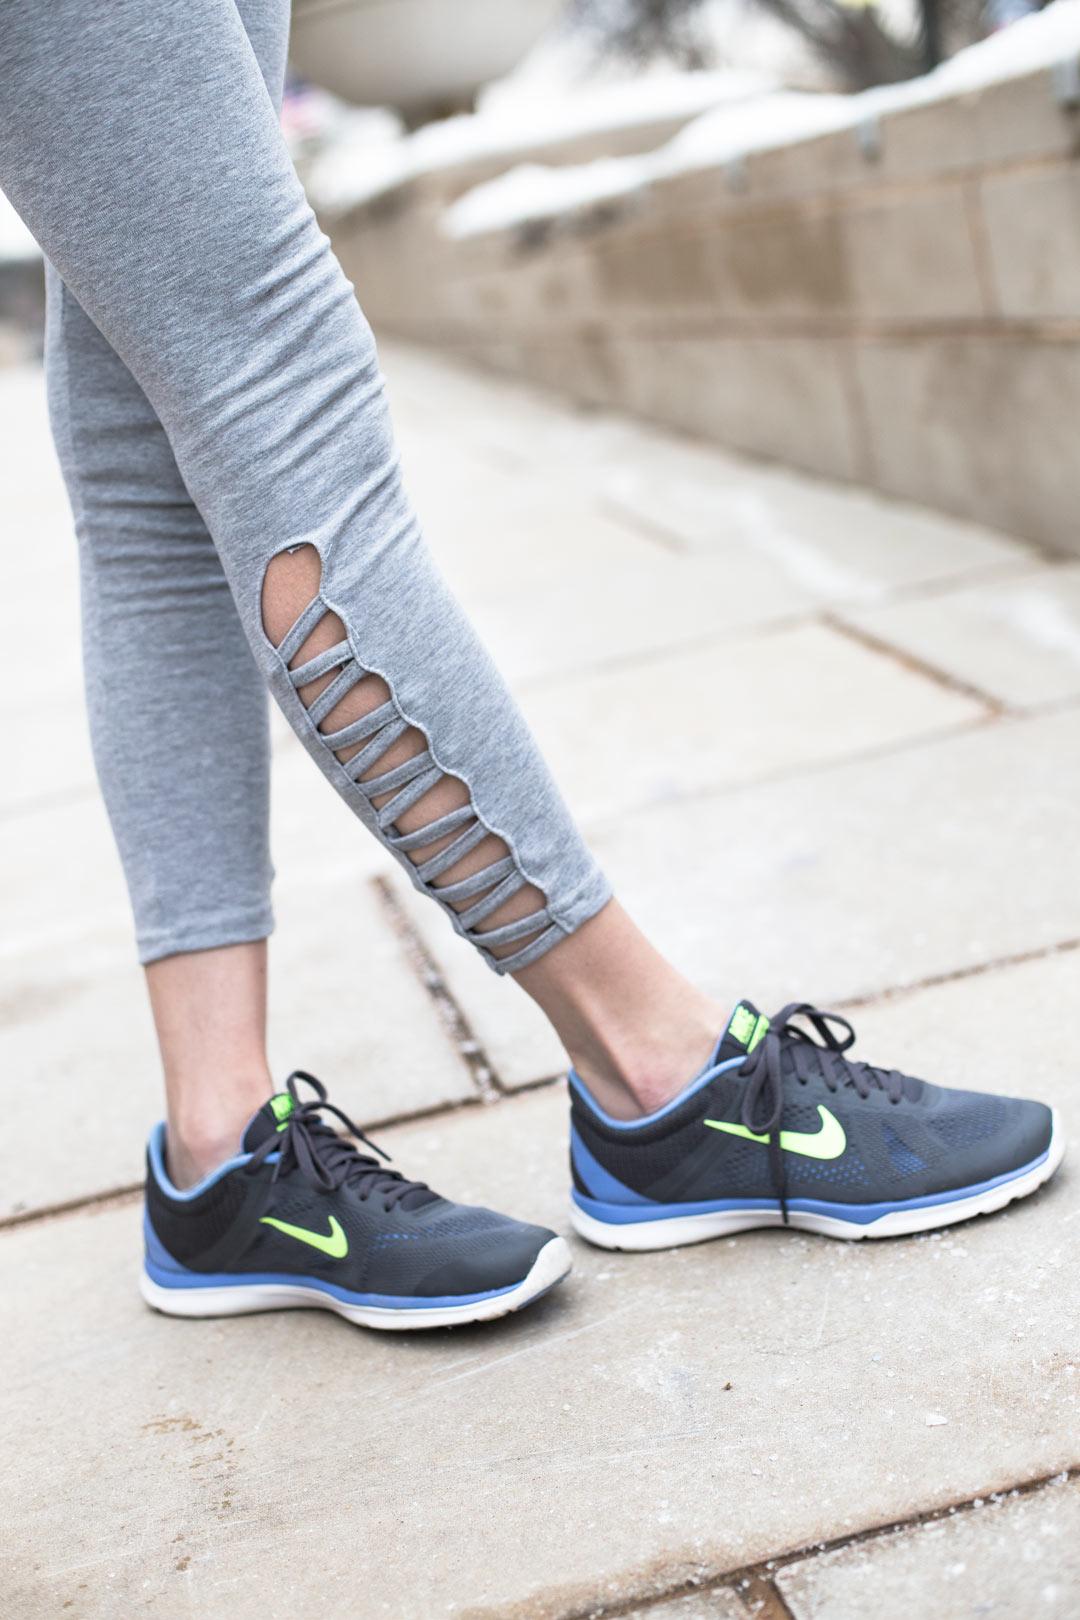 Shein Official Athleisure Leggings